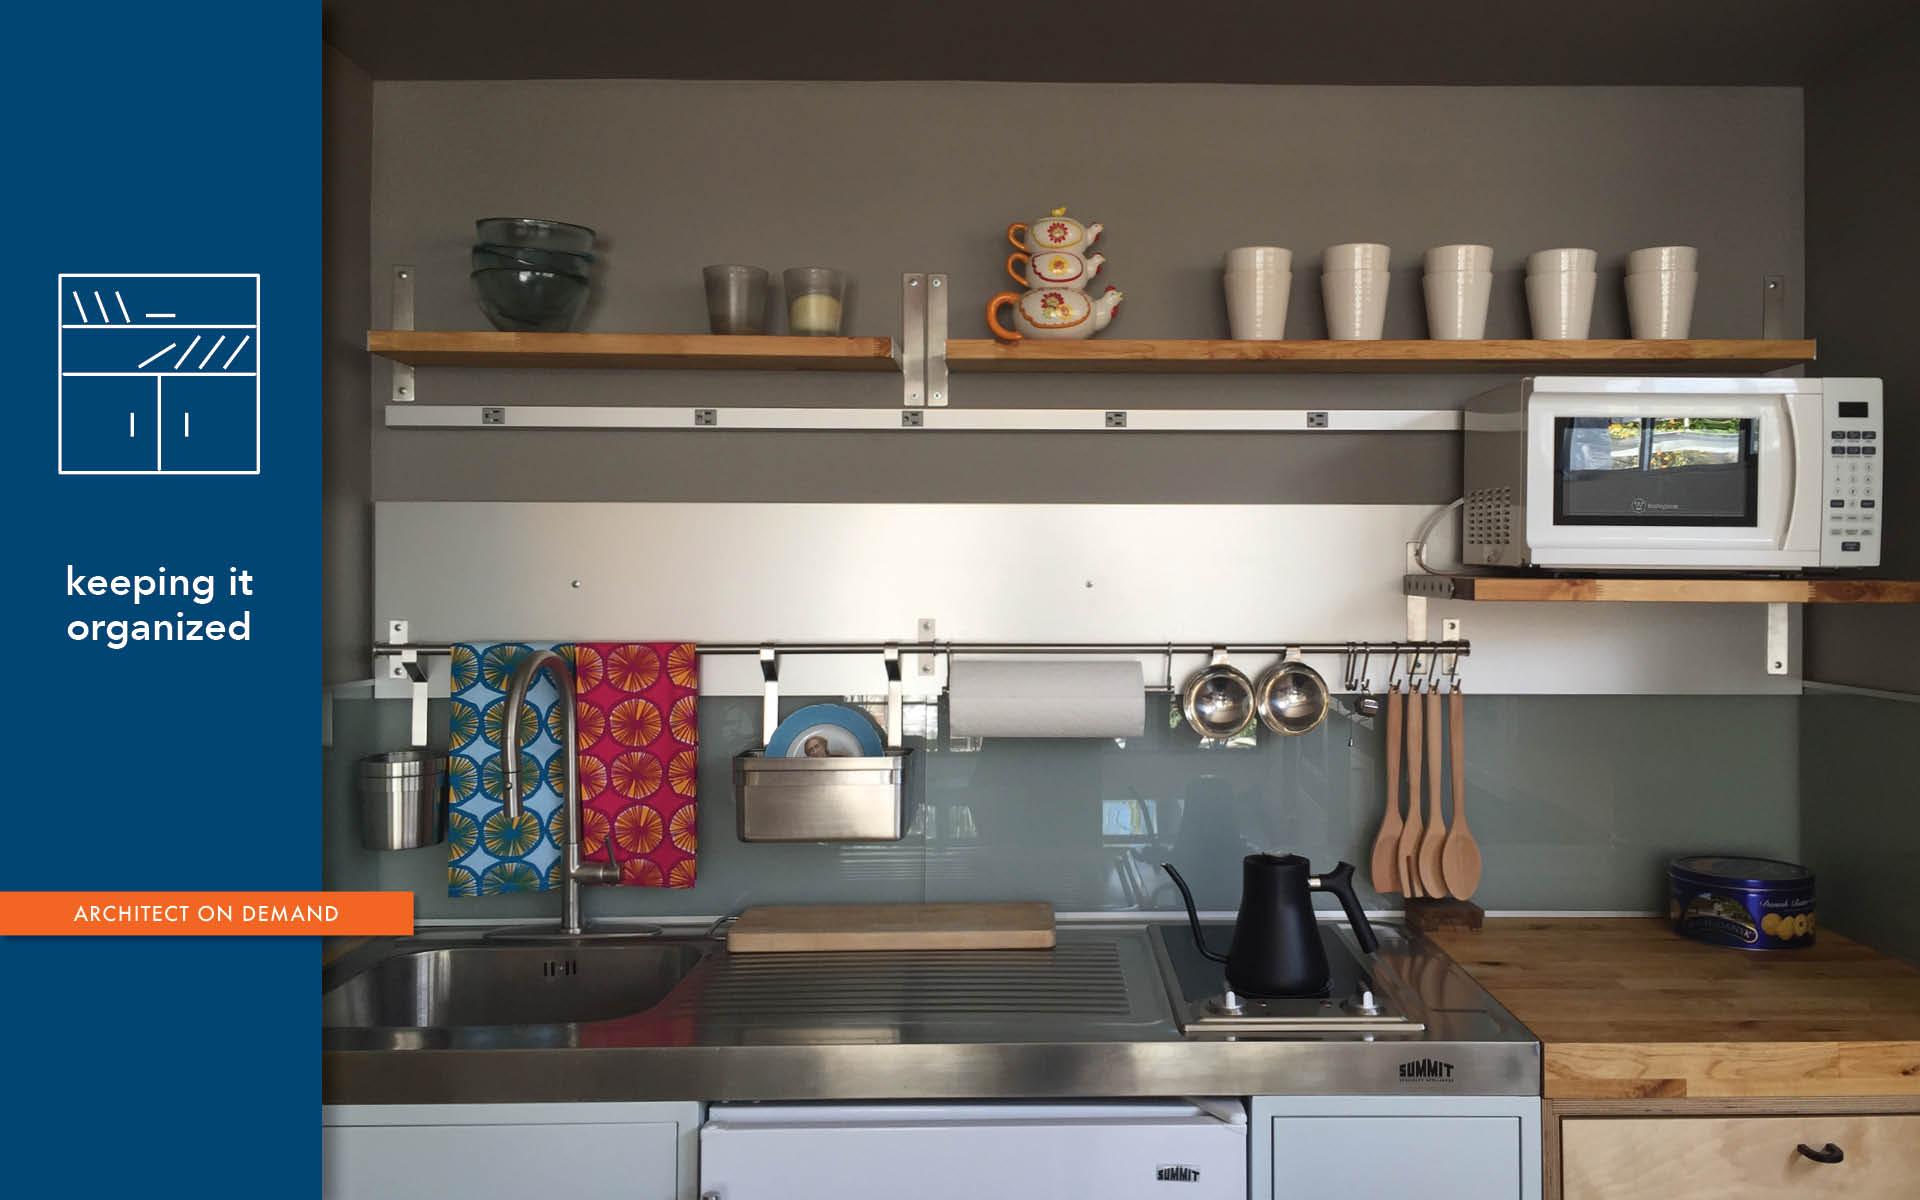 customizing IKEA, wall-mounted organizer, architect on demand, advice without strings